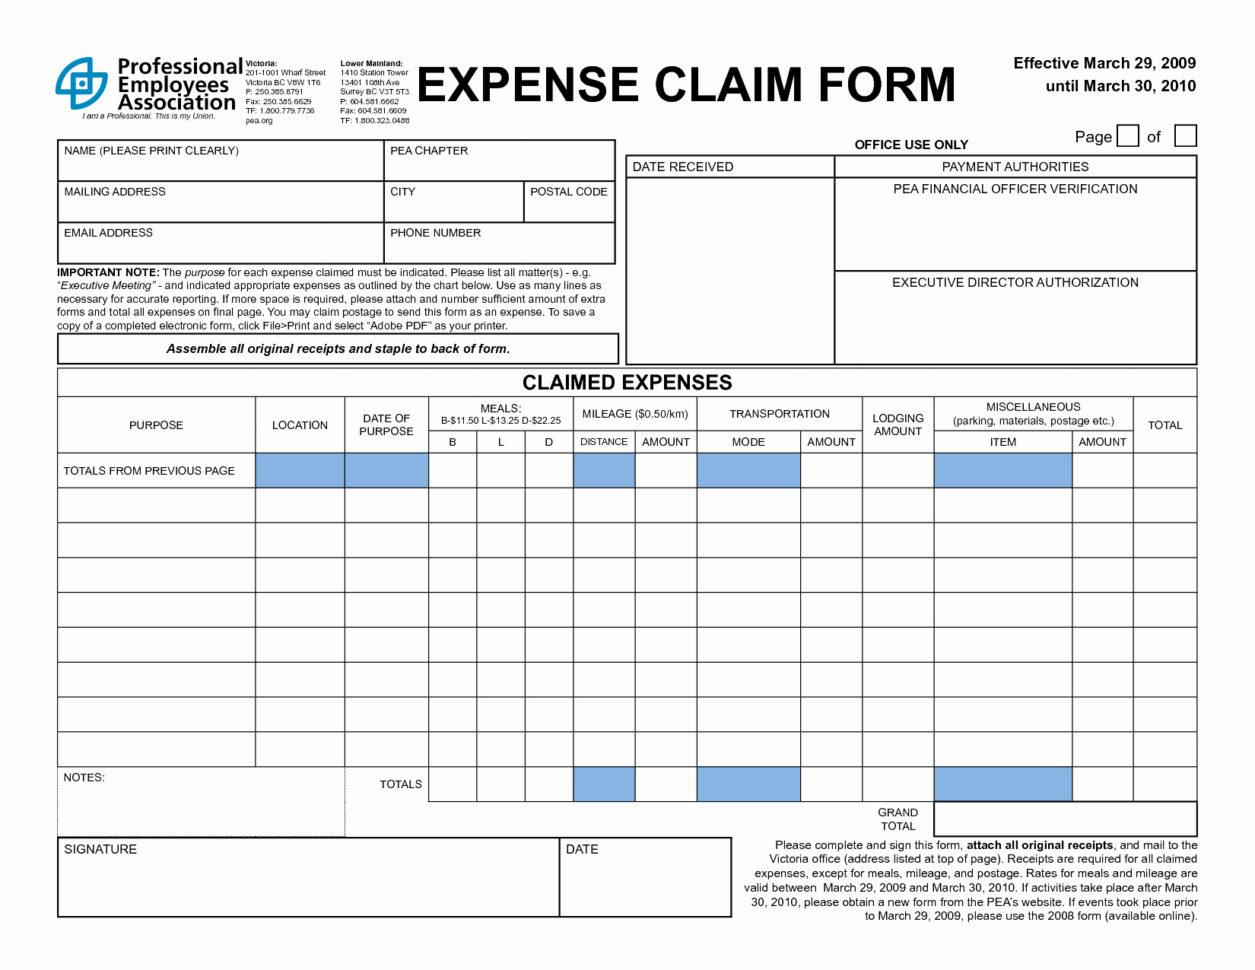 Pc Miler Spreadsheets Regarding Pc Miler Spreadsheets Inspirational Pc Miler Spreadsheets New Pc